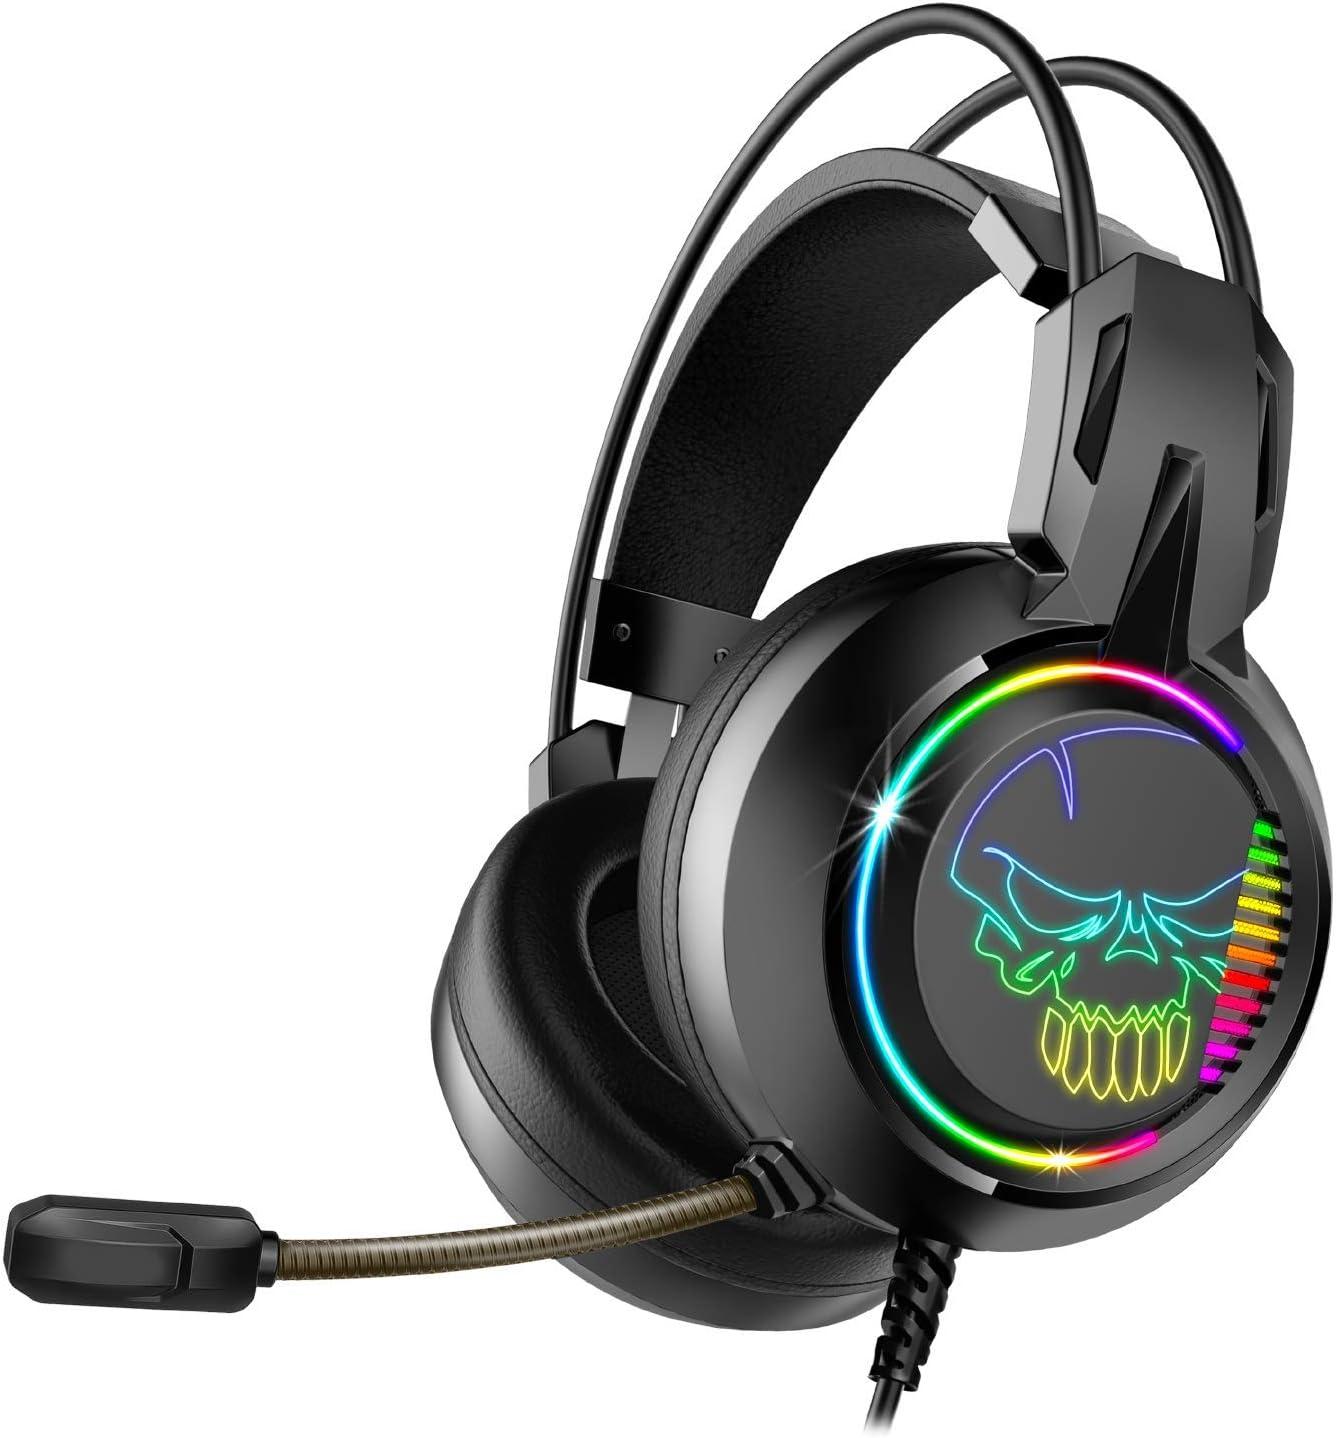 Casque Noir Audio Pro Gamer HP 40mm SPIRIT OF GAMER RGB ELITE-H10 USB 2M Microphone Flexible Simili Cuir Son Surround 7.1 Virtual